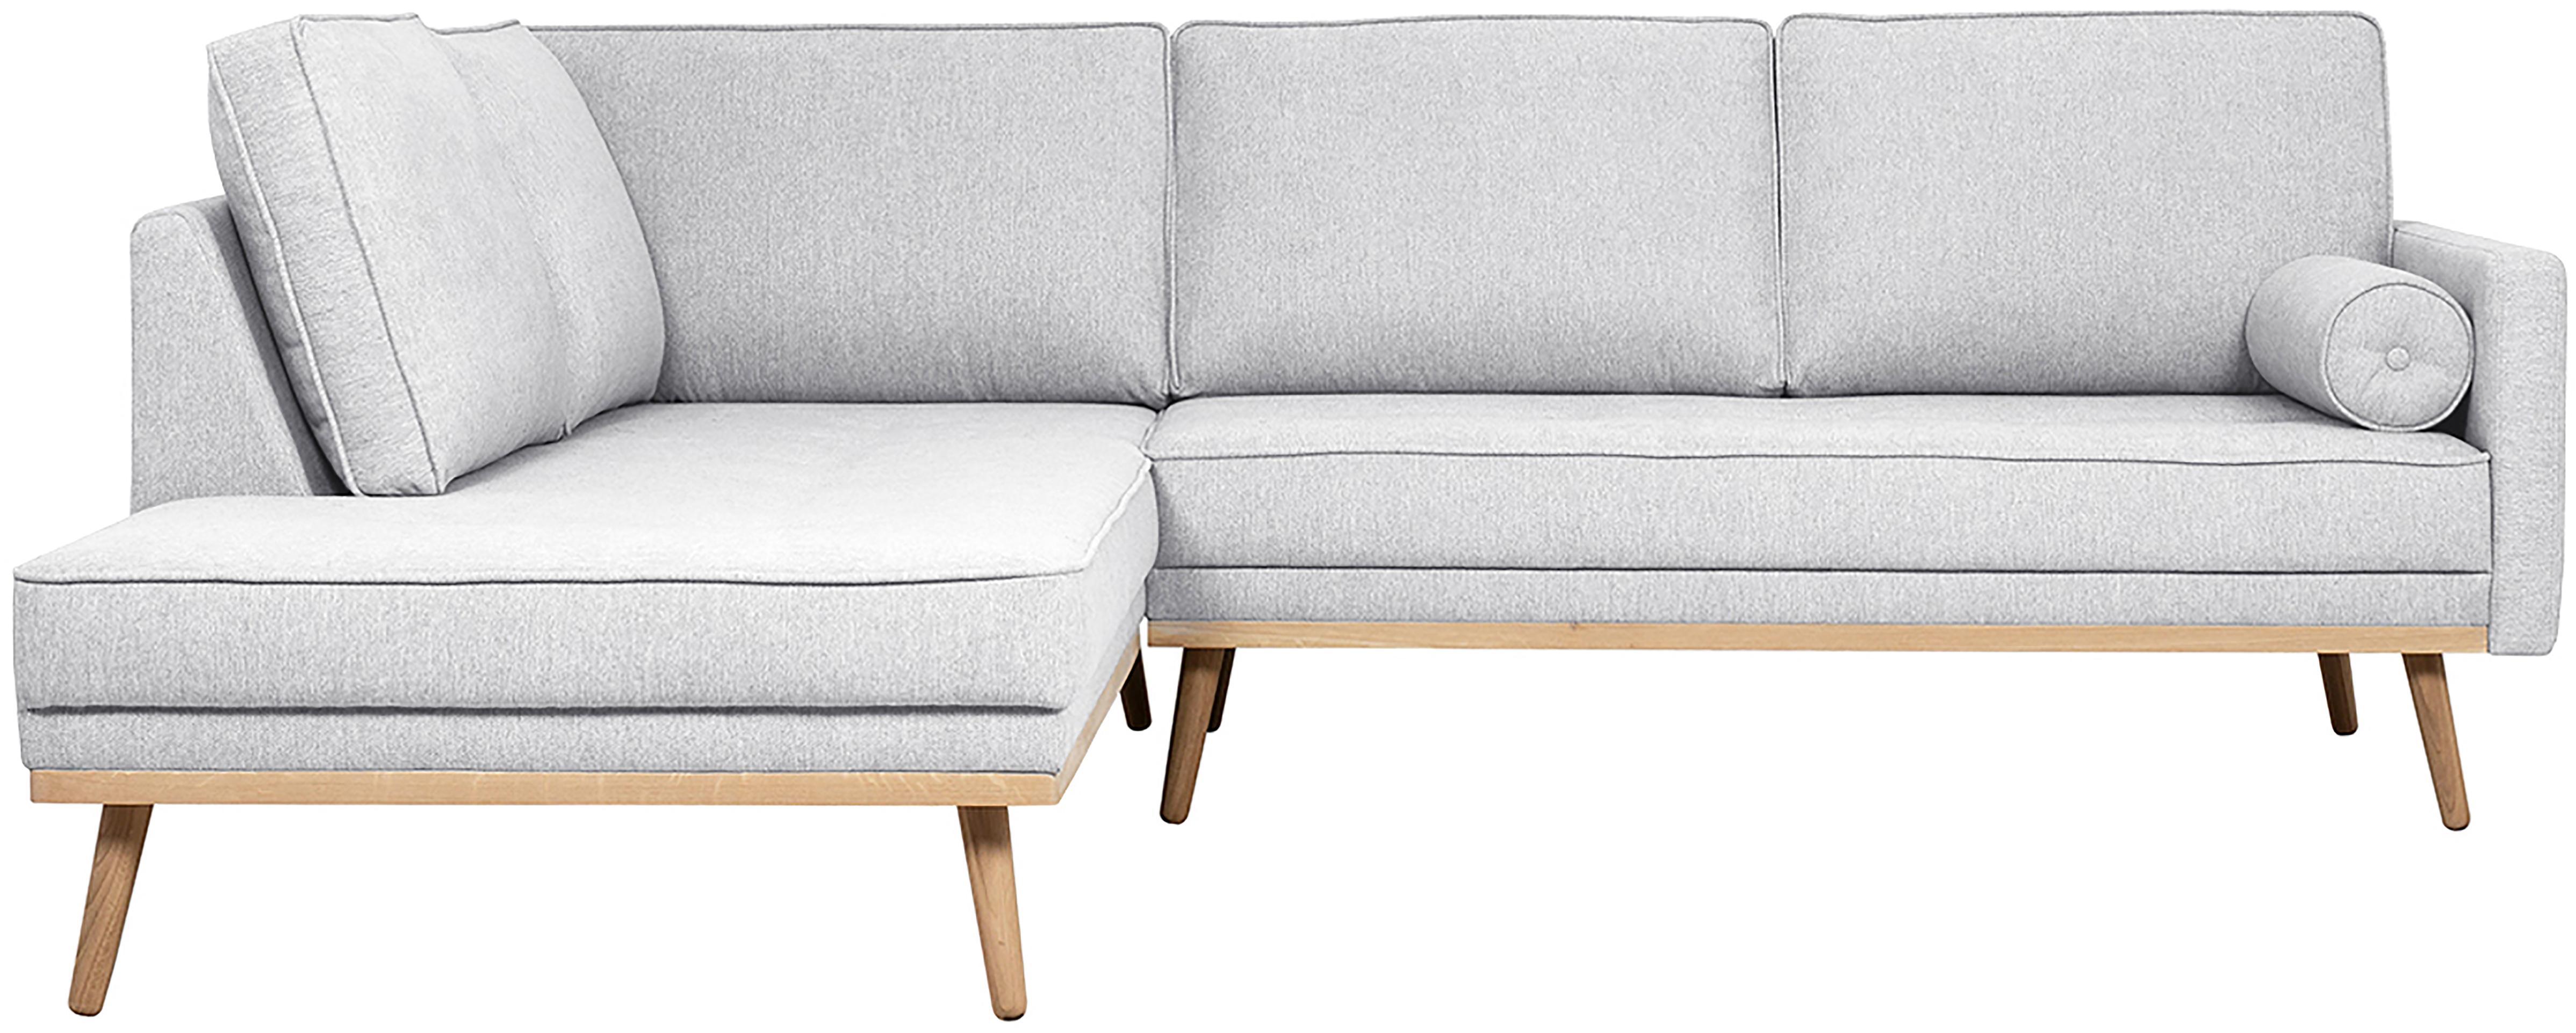 Ecksofa Saint (3-Sitzer), Bezug: Polyester Der hochwertige, Gestell: Massives Kiefernholz, Spa, Webstoff Hellgrau, 243 x 70 cm